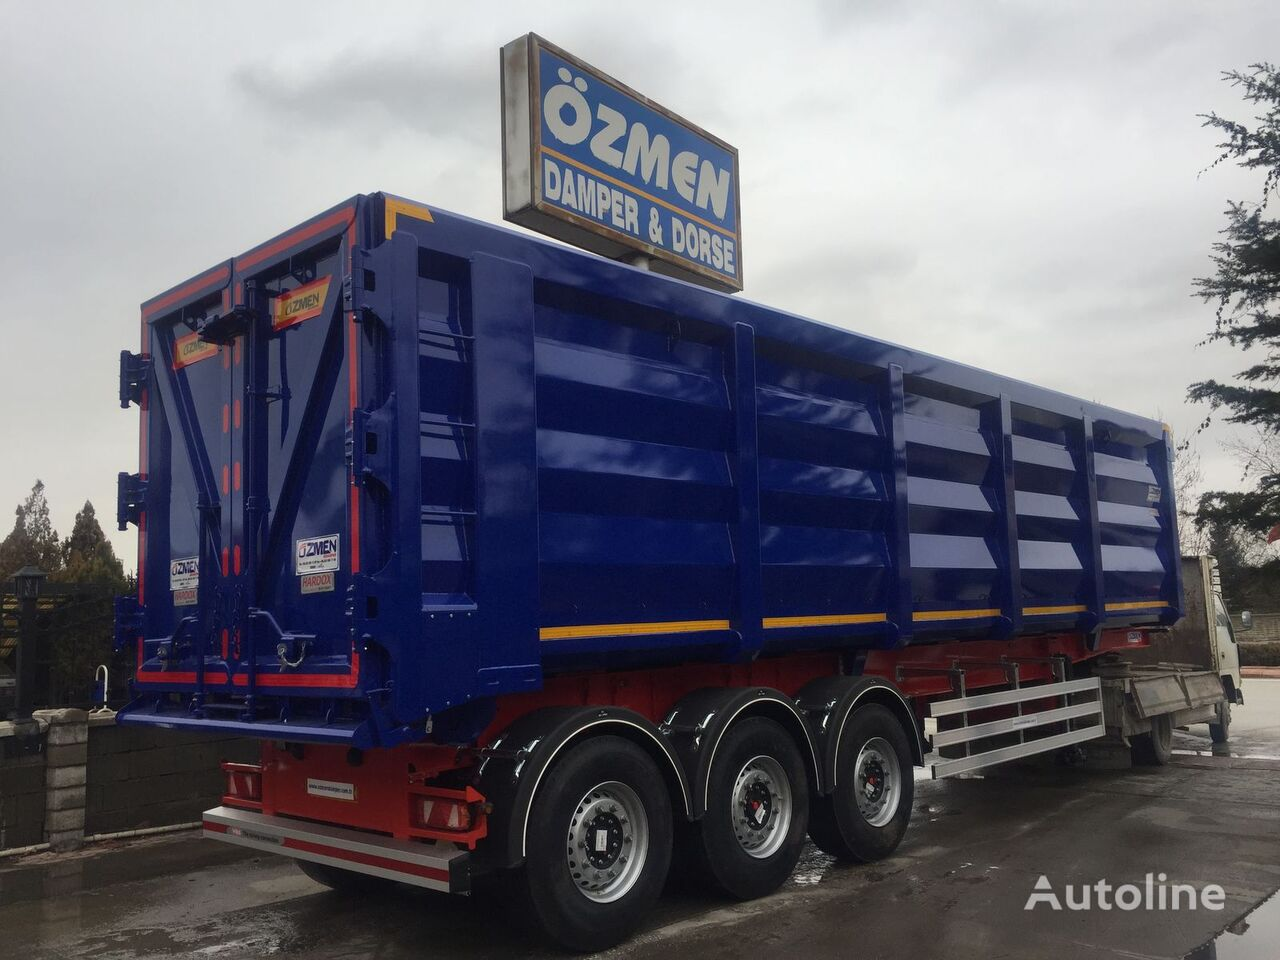 new Ozmen Damper 55 m3 SCRAP METAL  CARRIER grain semi-trailer